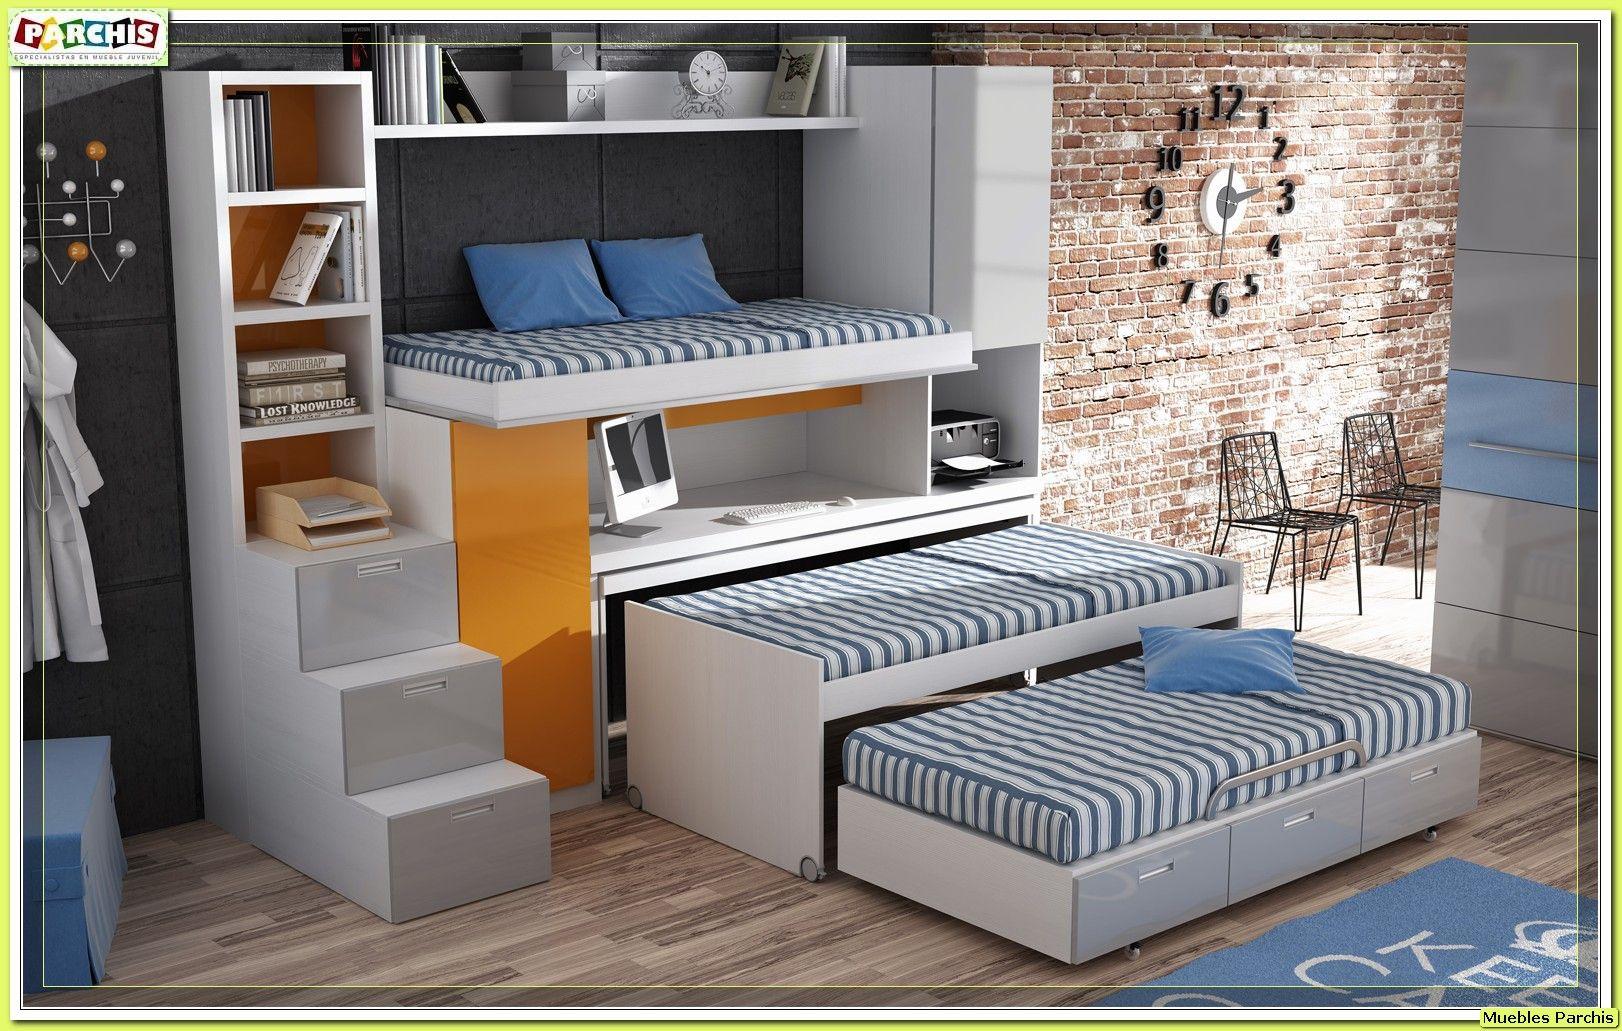 Literas triples para pladur sin anclar a la pared mueble - Literas para ninos pequenos ...